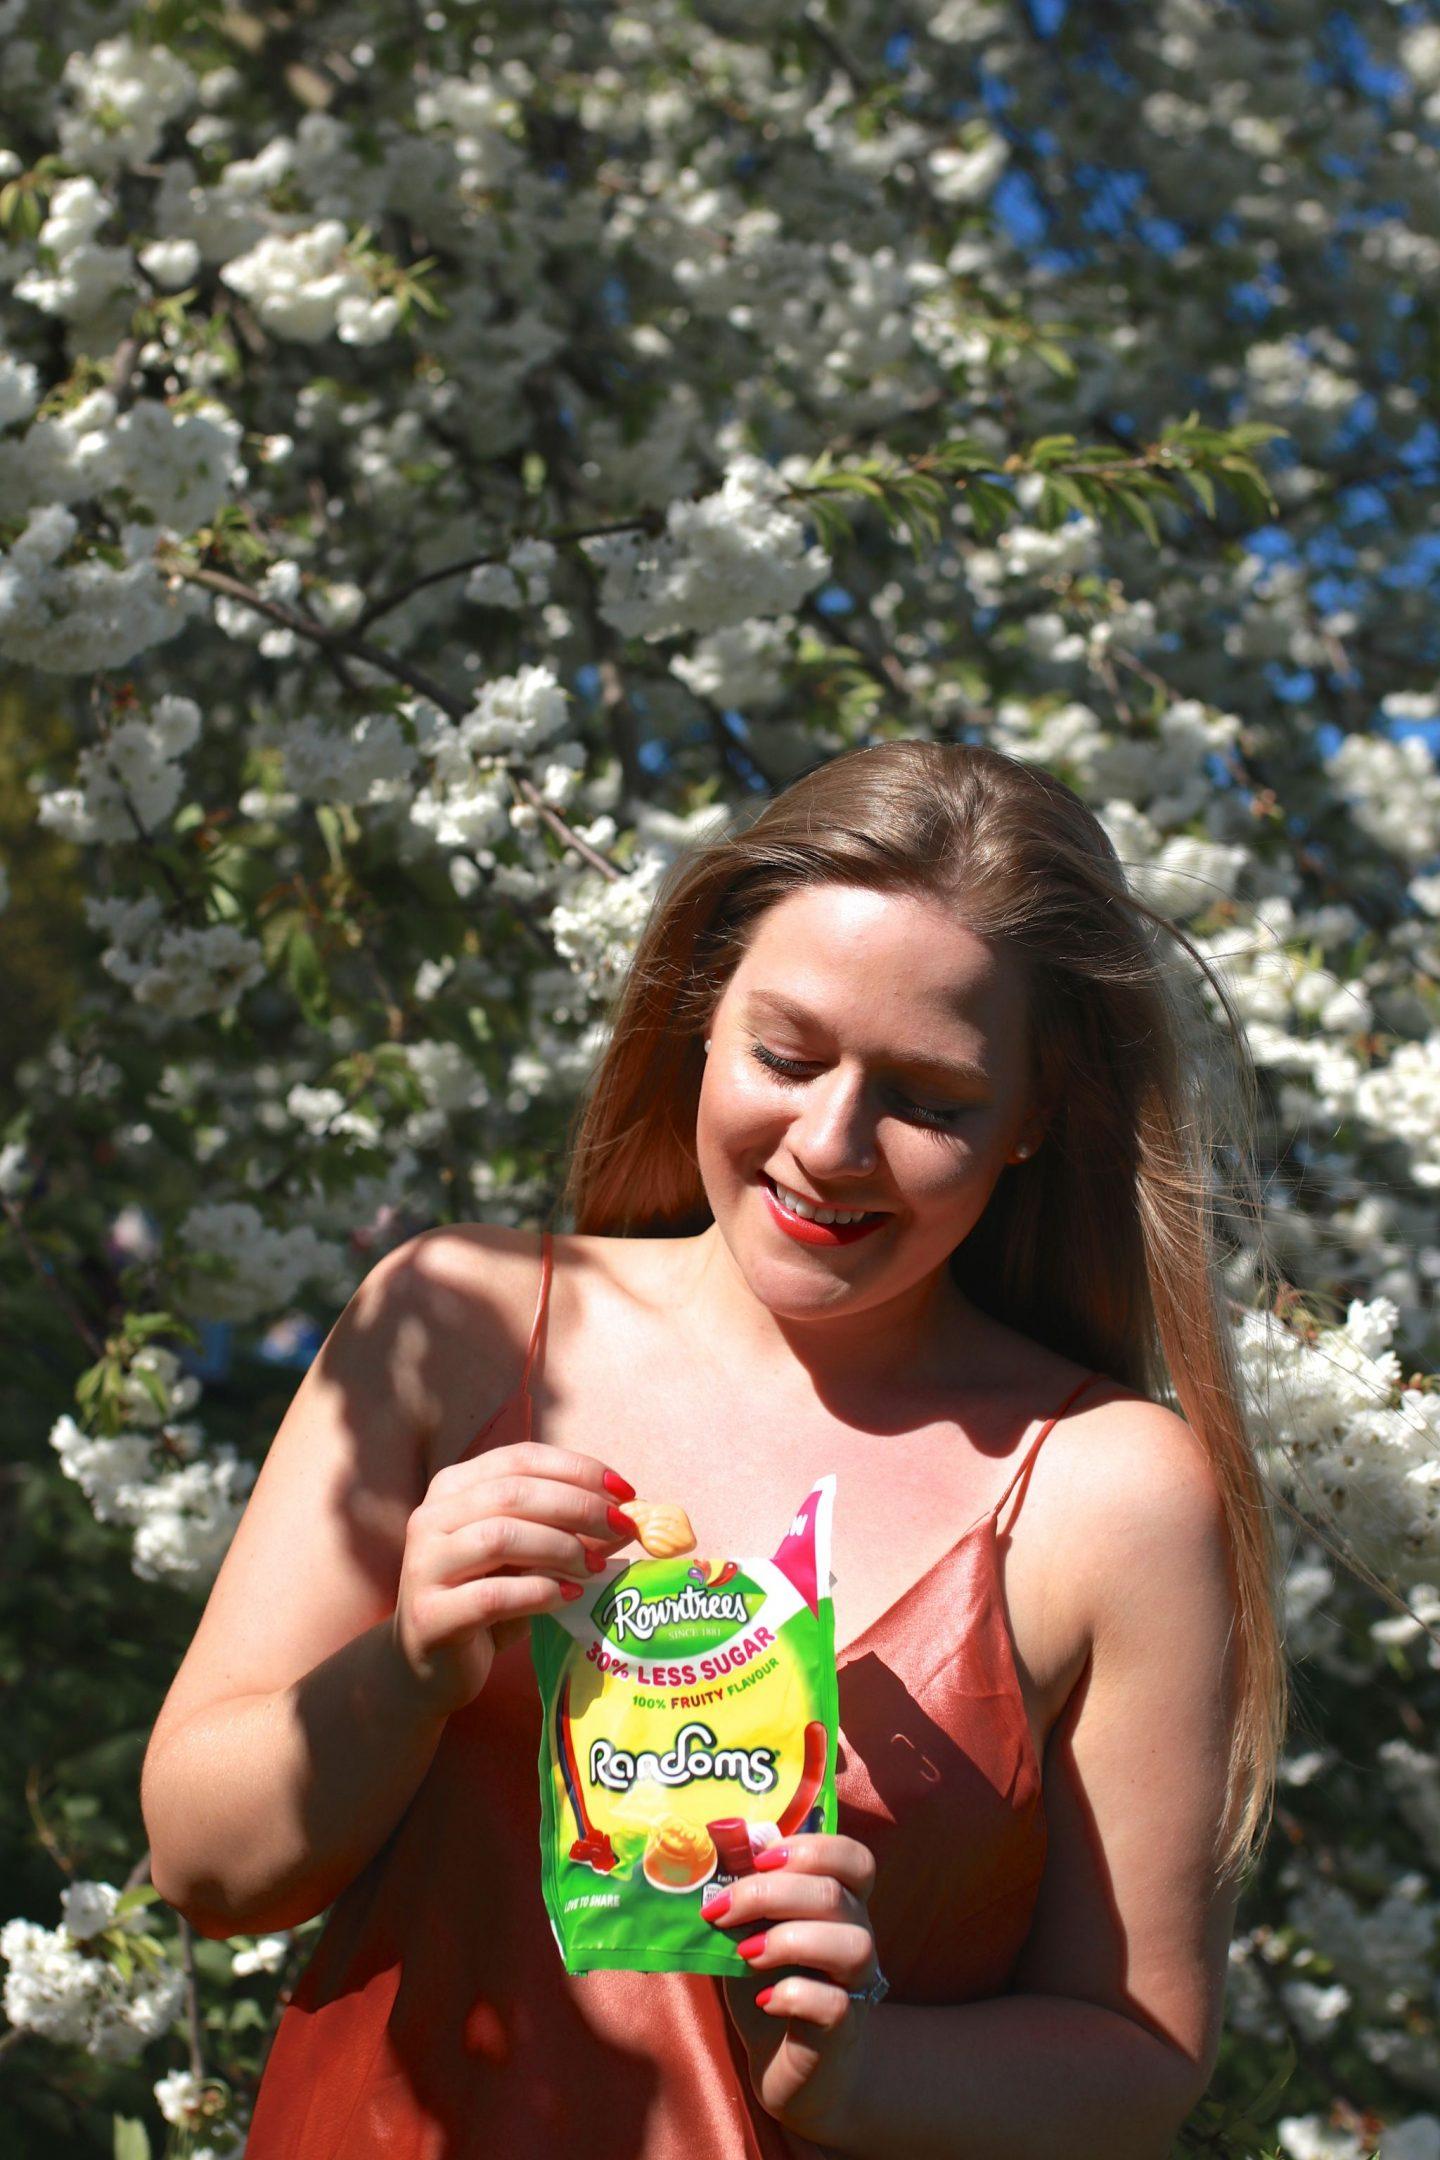 Katie heath and Ben Heath with Rowntrees Randoms 30% less sugar